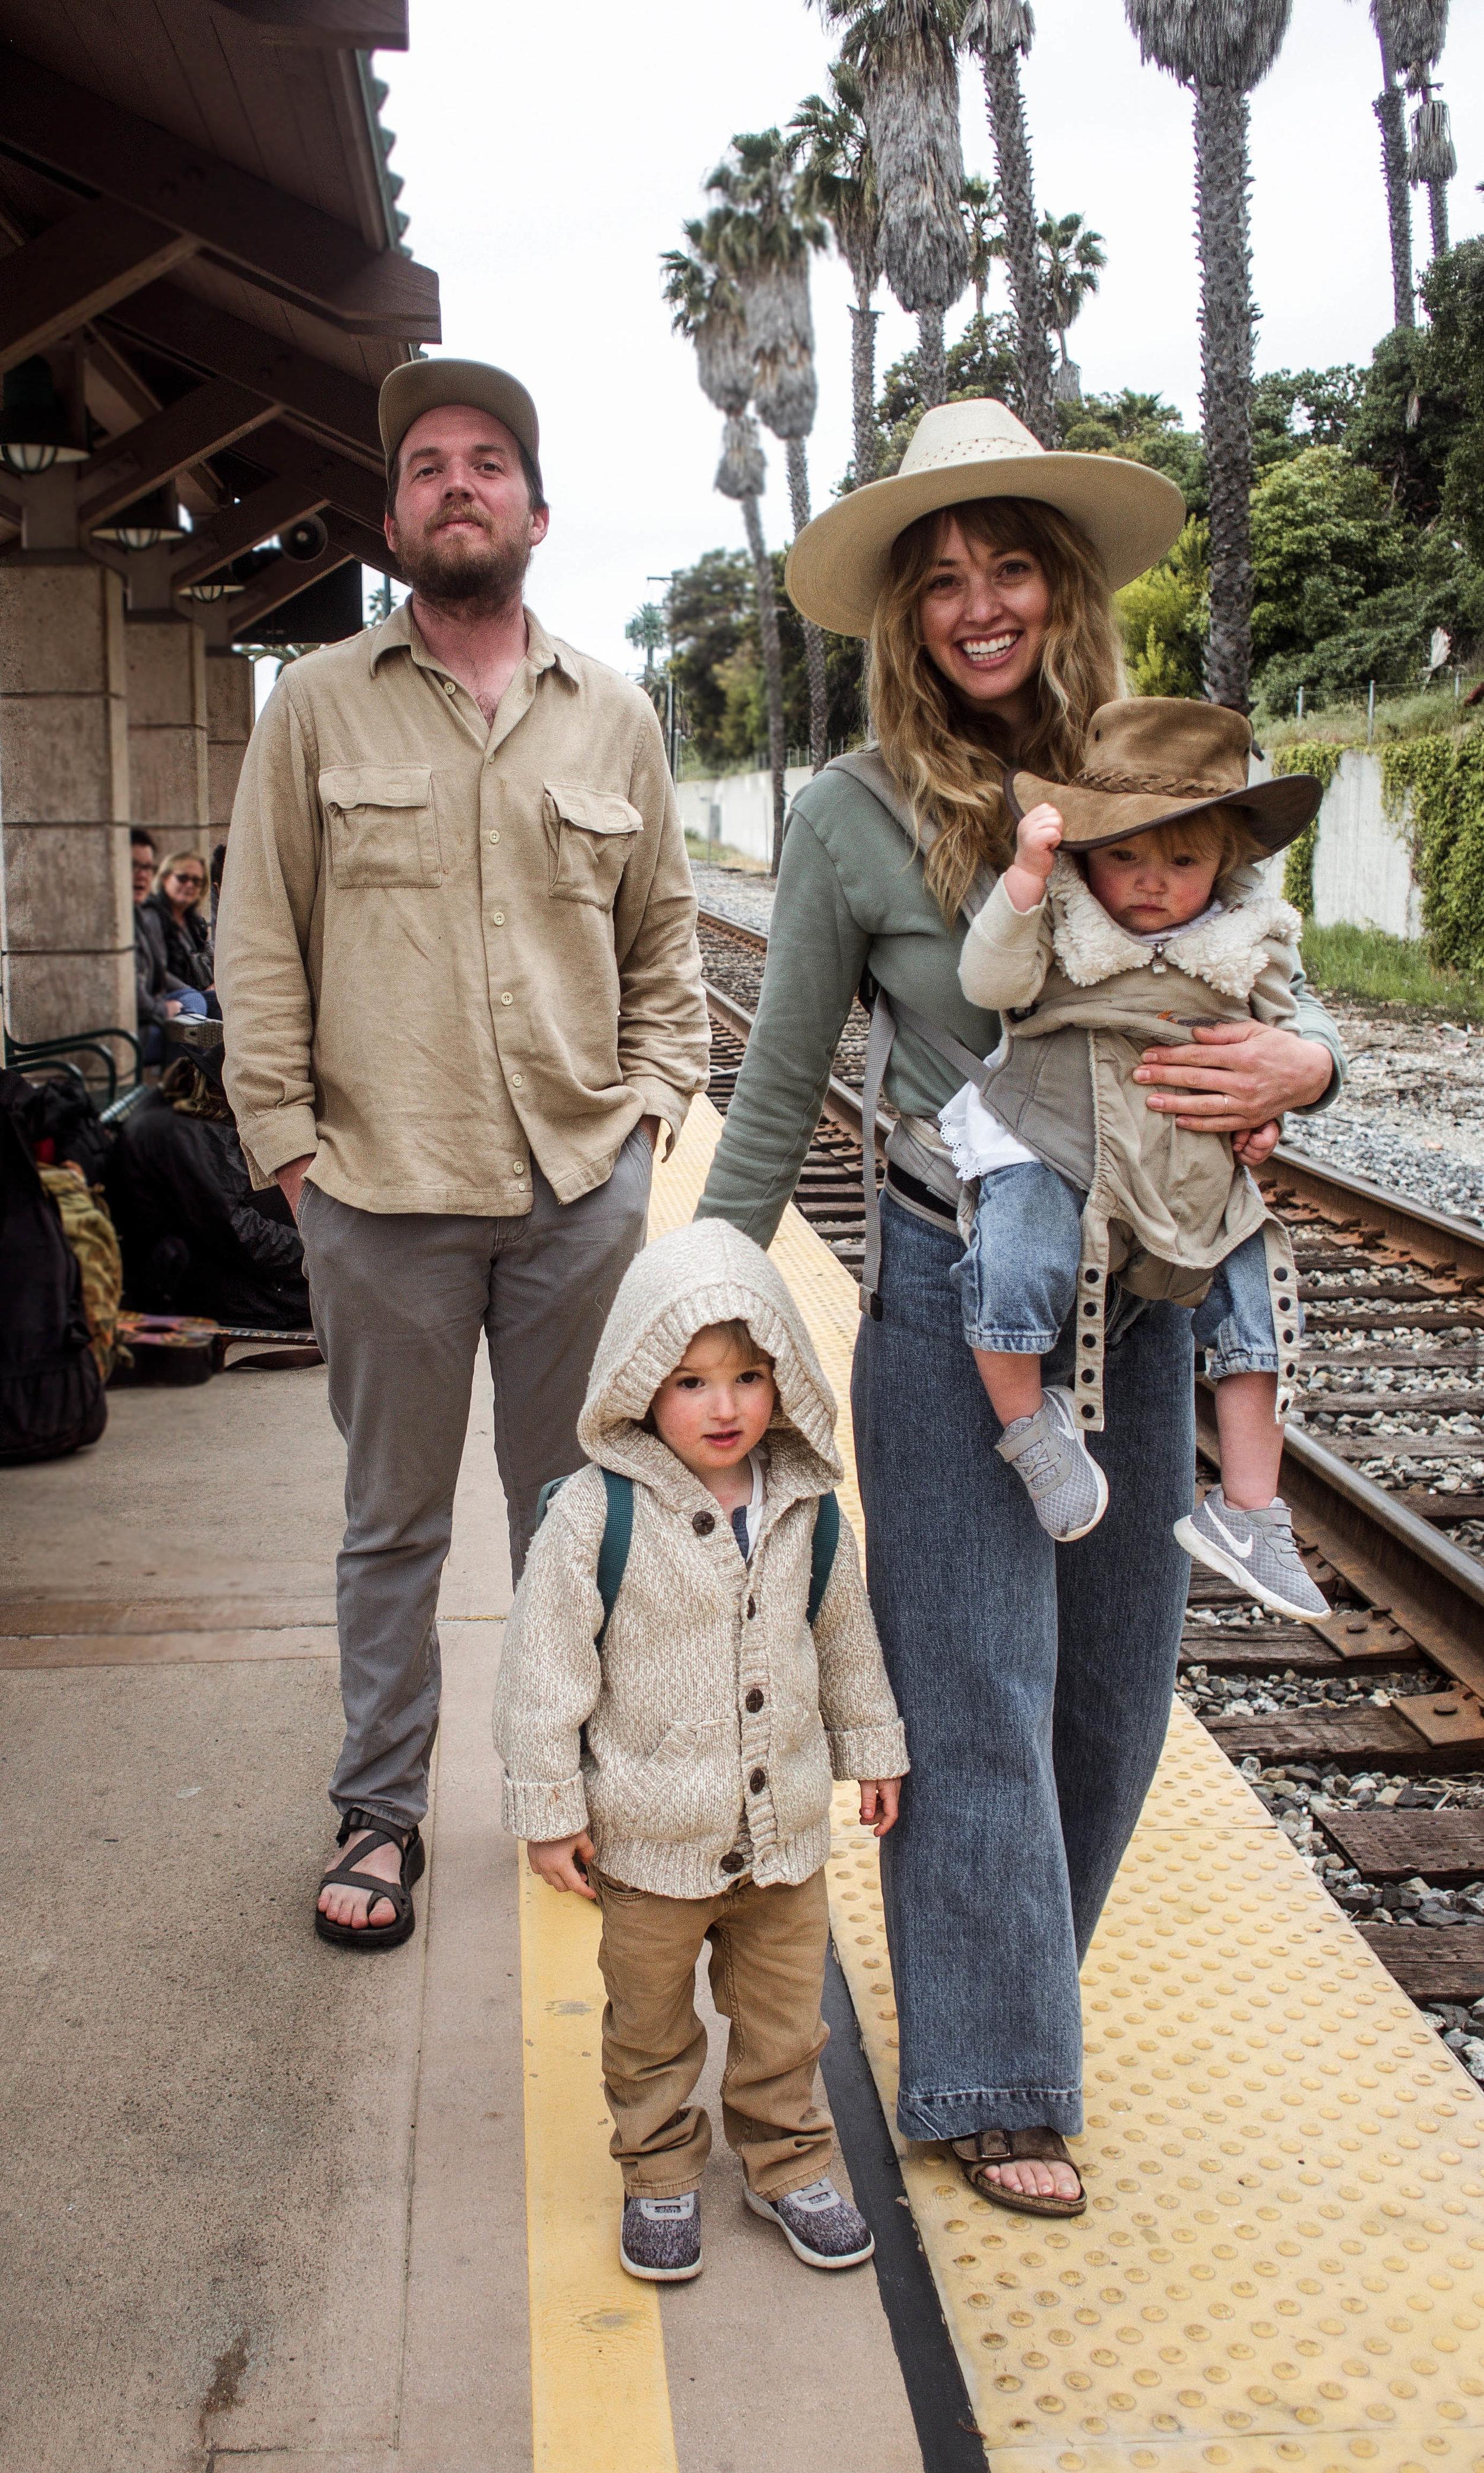 family at the Ventura train station